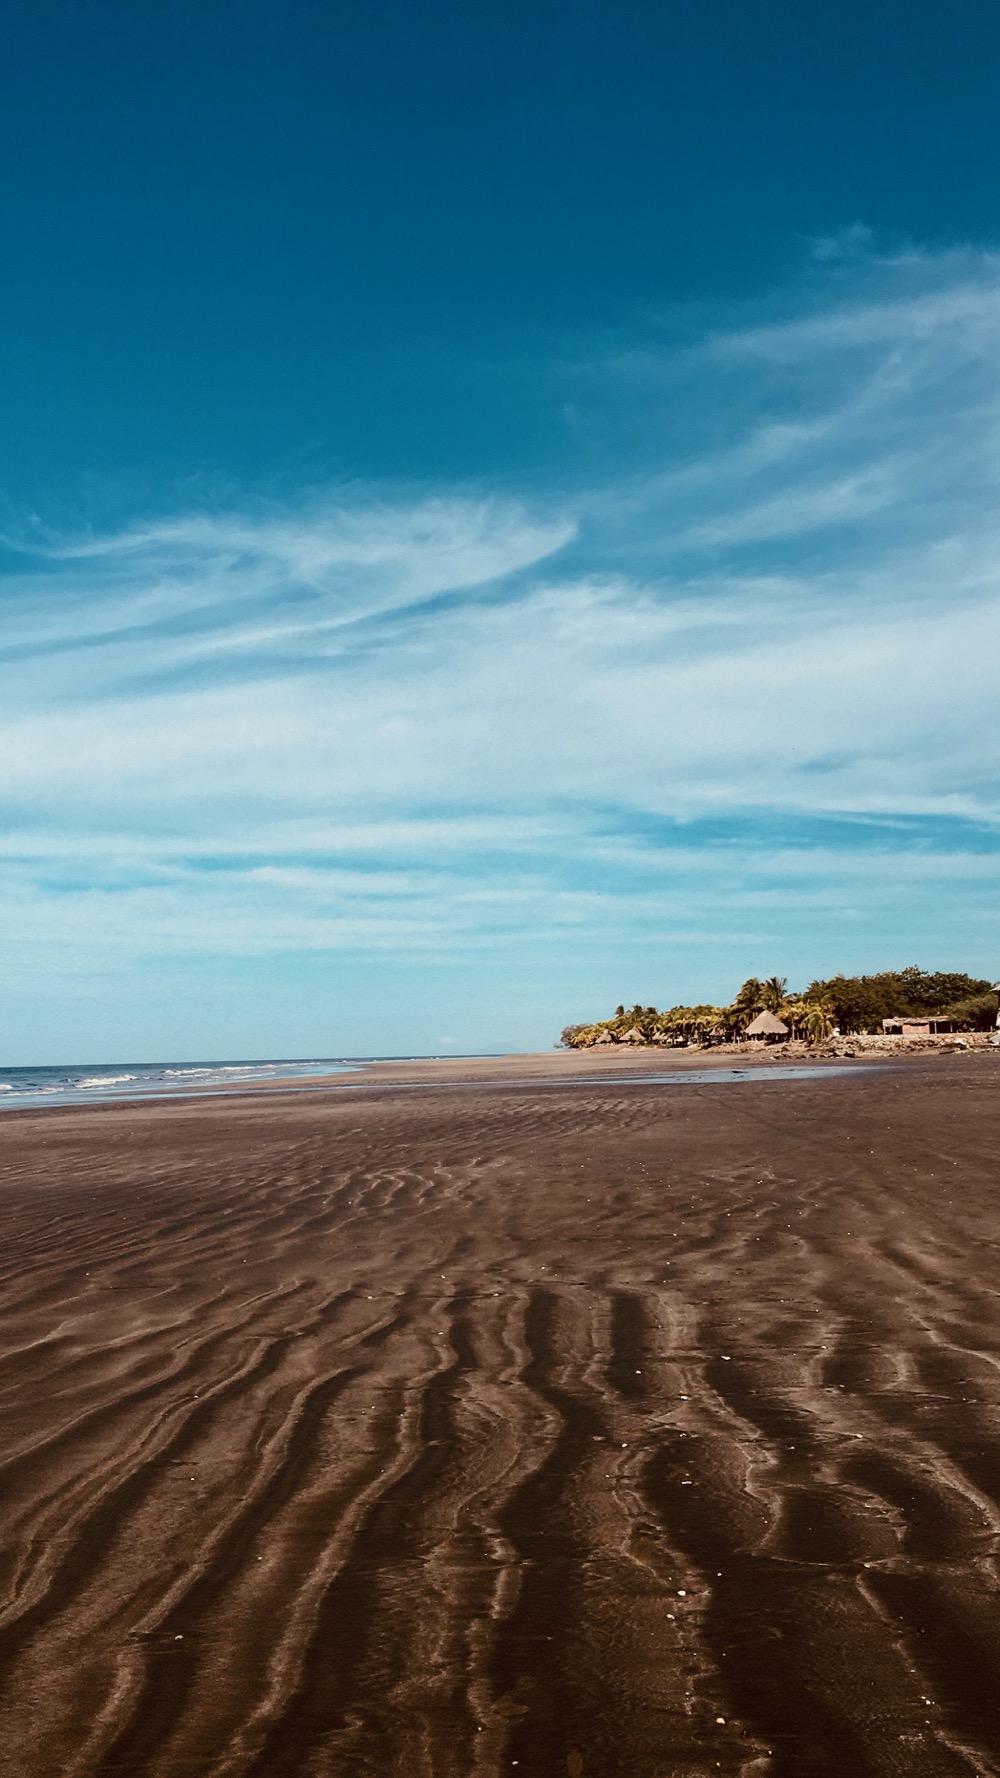 Plage Las Dunas Resort Nicaragua - Chipiron Surf Trip